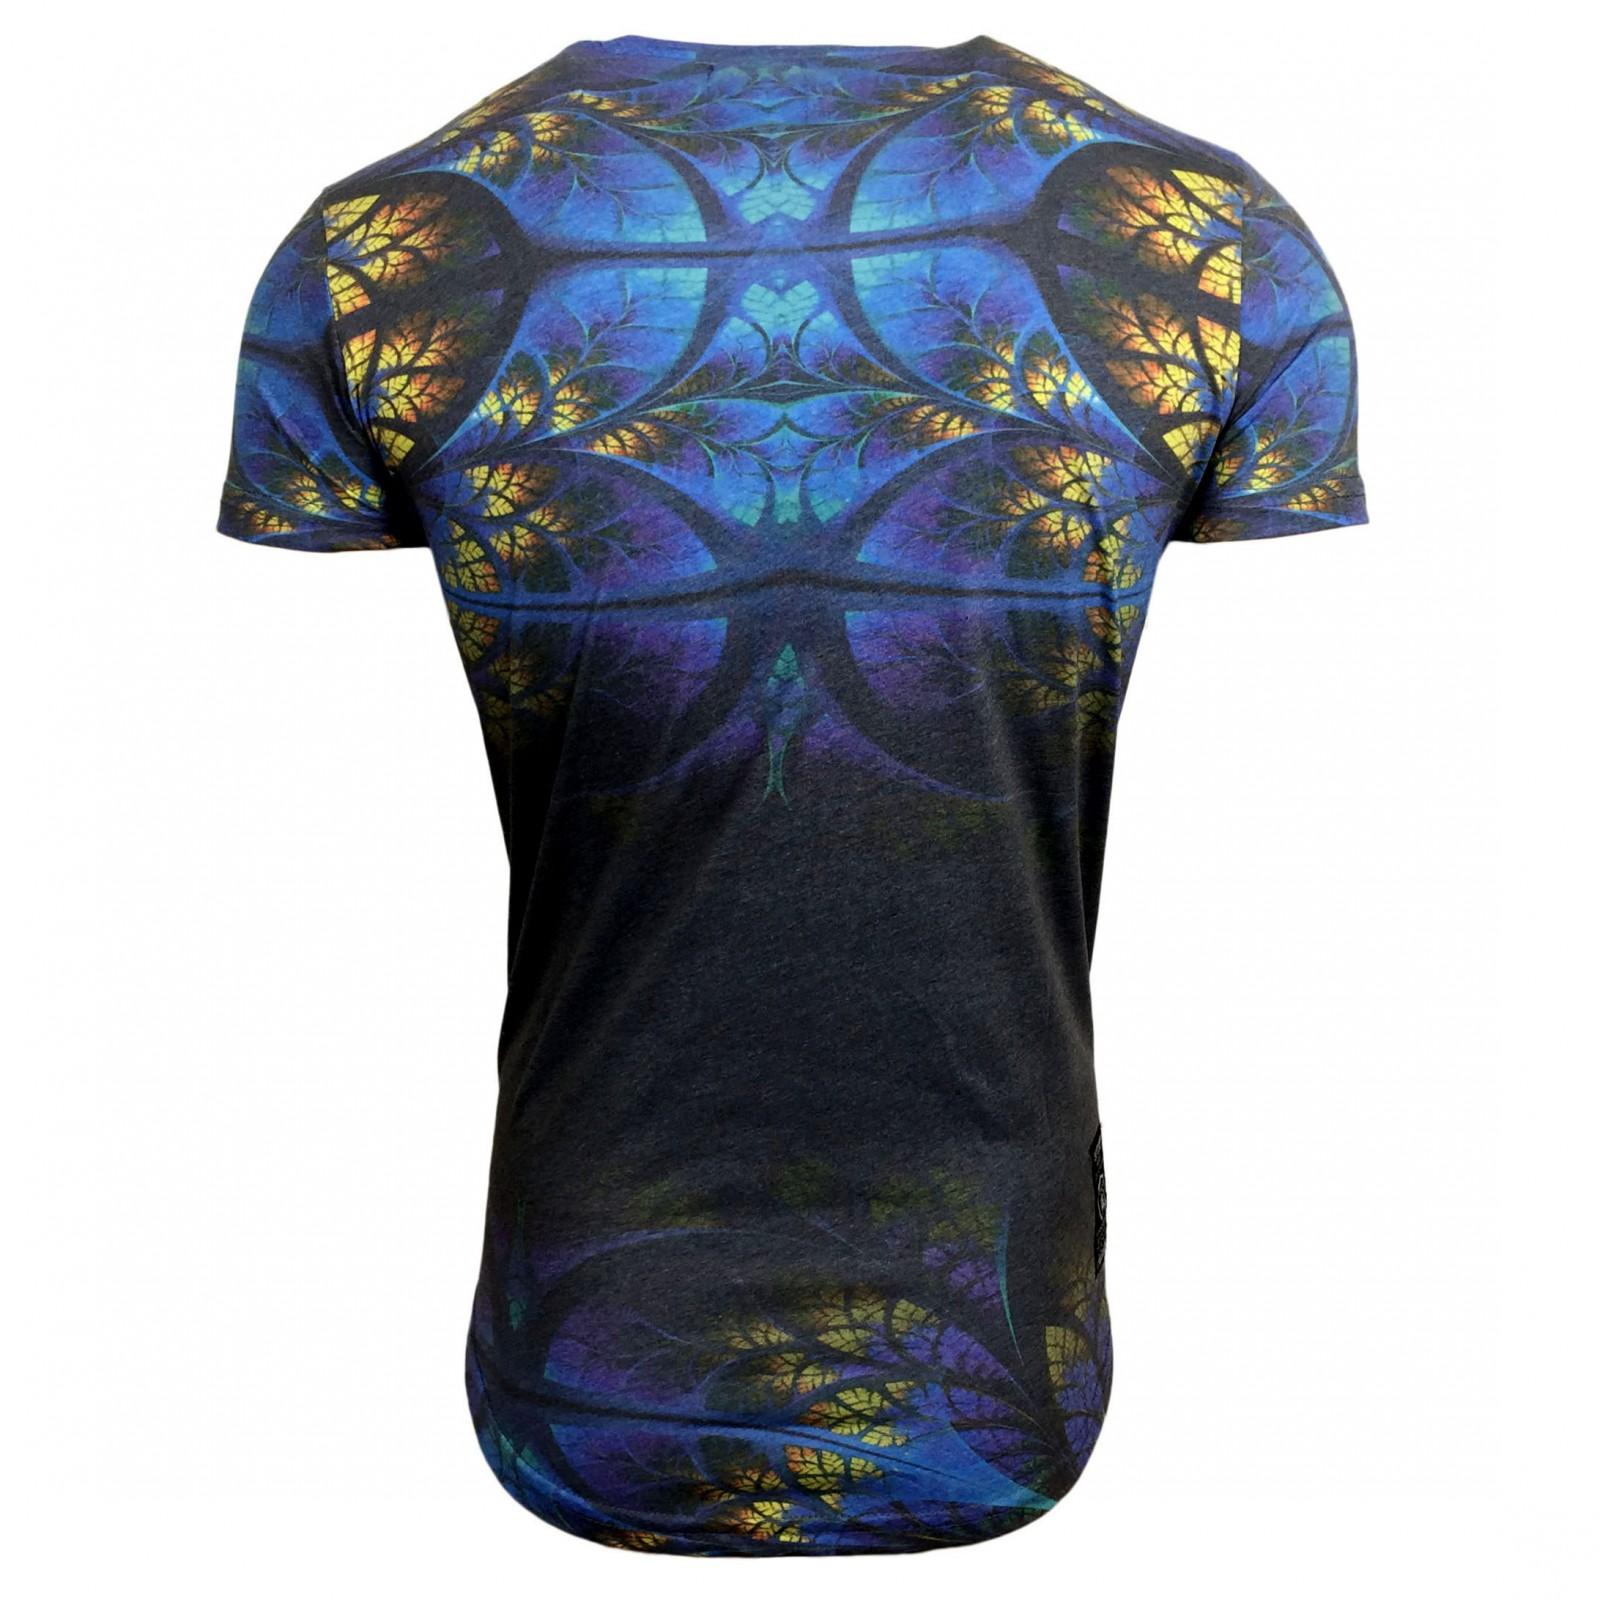 T Shirt Herren Kurzarm Grau Print Motiv A16834